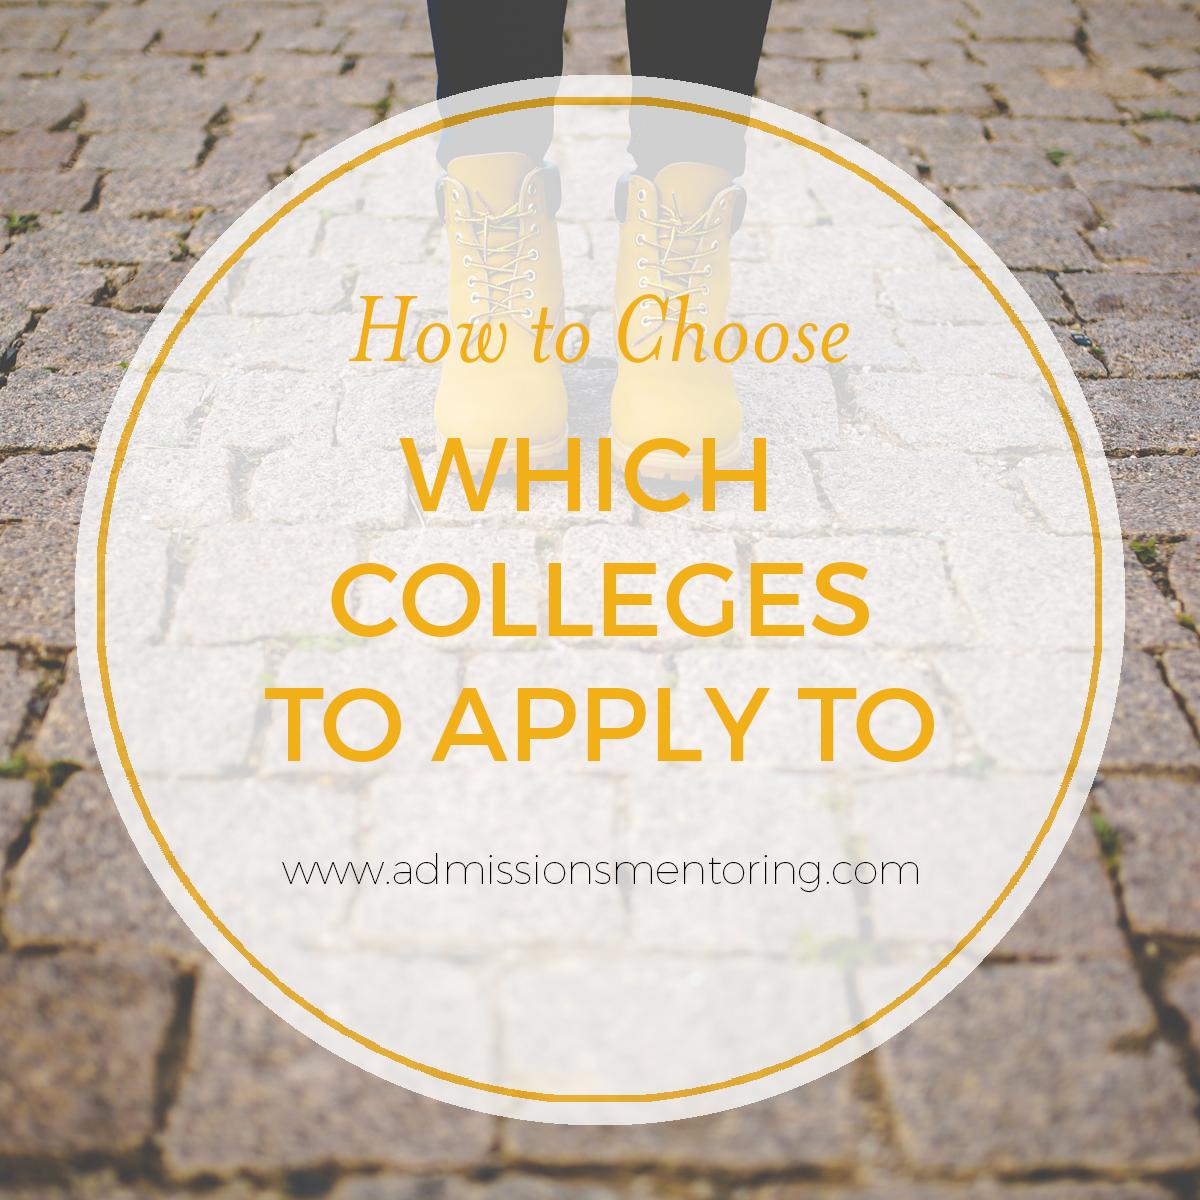 Admissions-Mentoring-Choose-Colleges.jpg